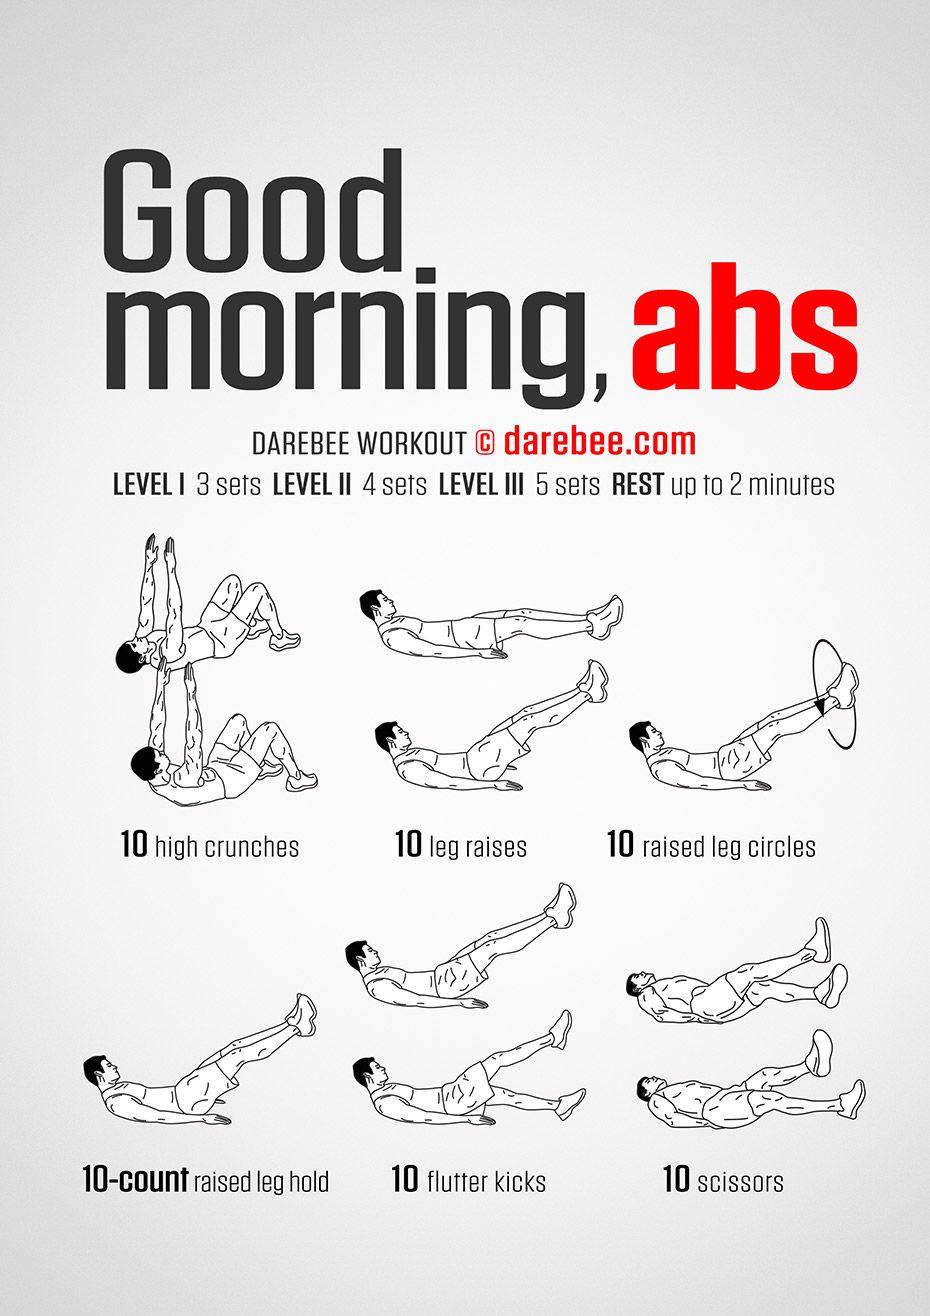 Good Morning Abs workout.